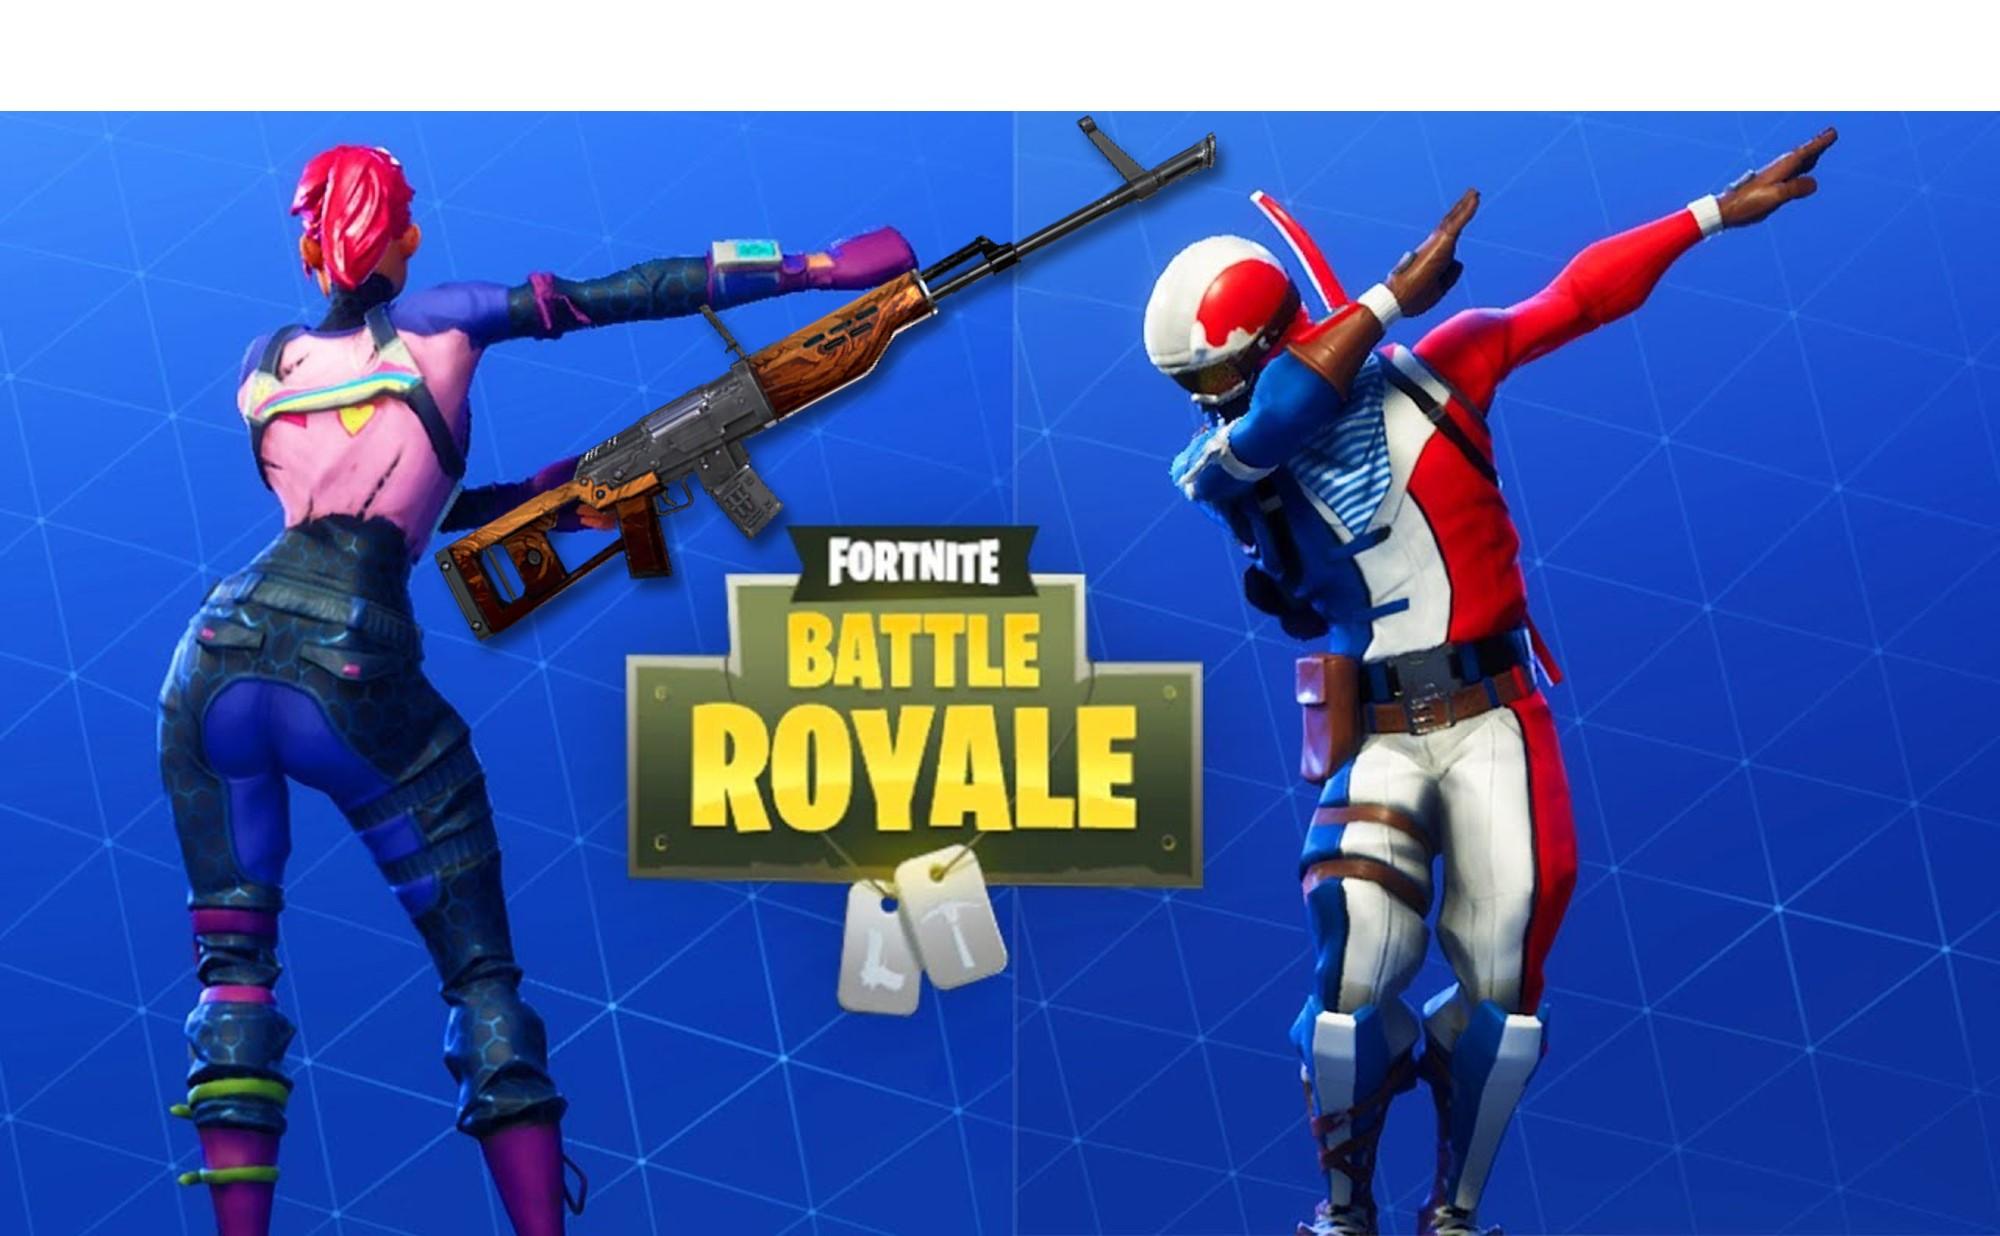 Doch kein Jetpack in Fortnite: Battle Royale – es kommt das Jagdgewehr